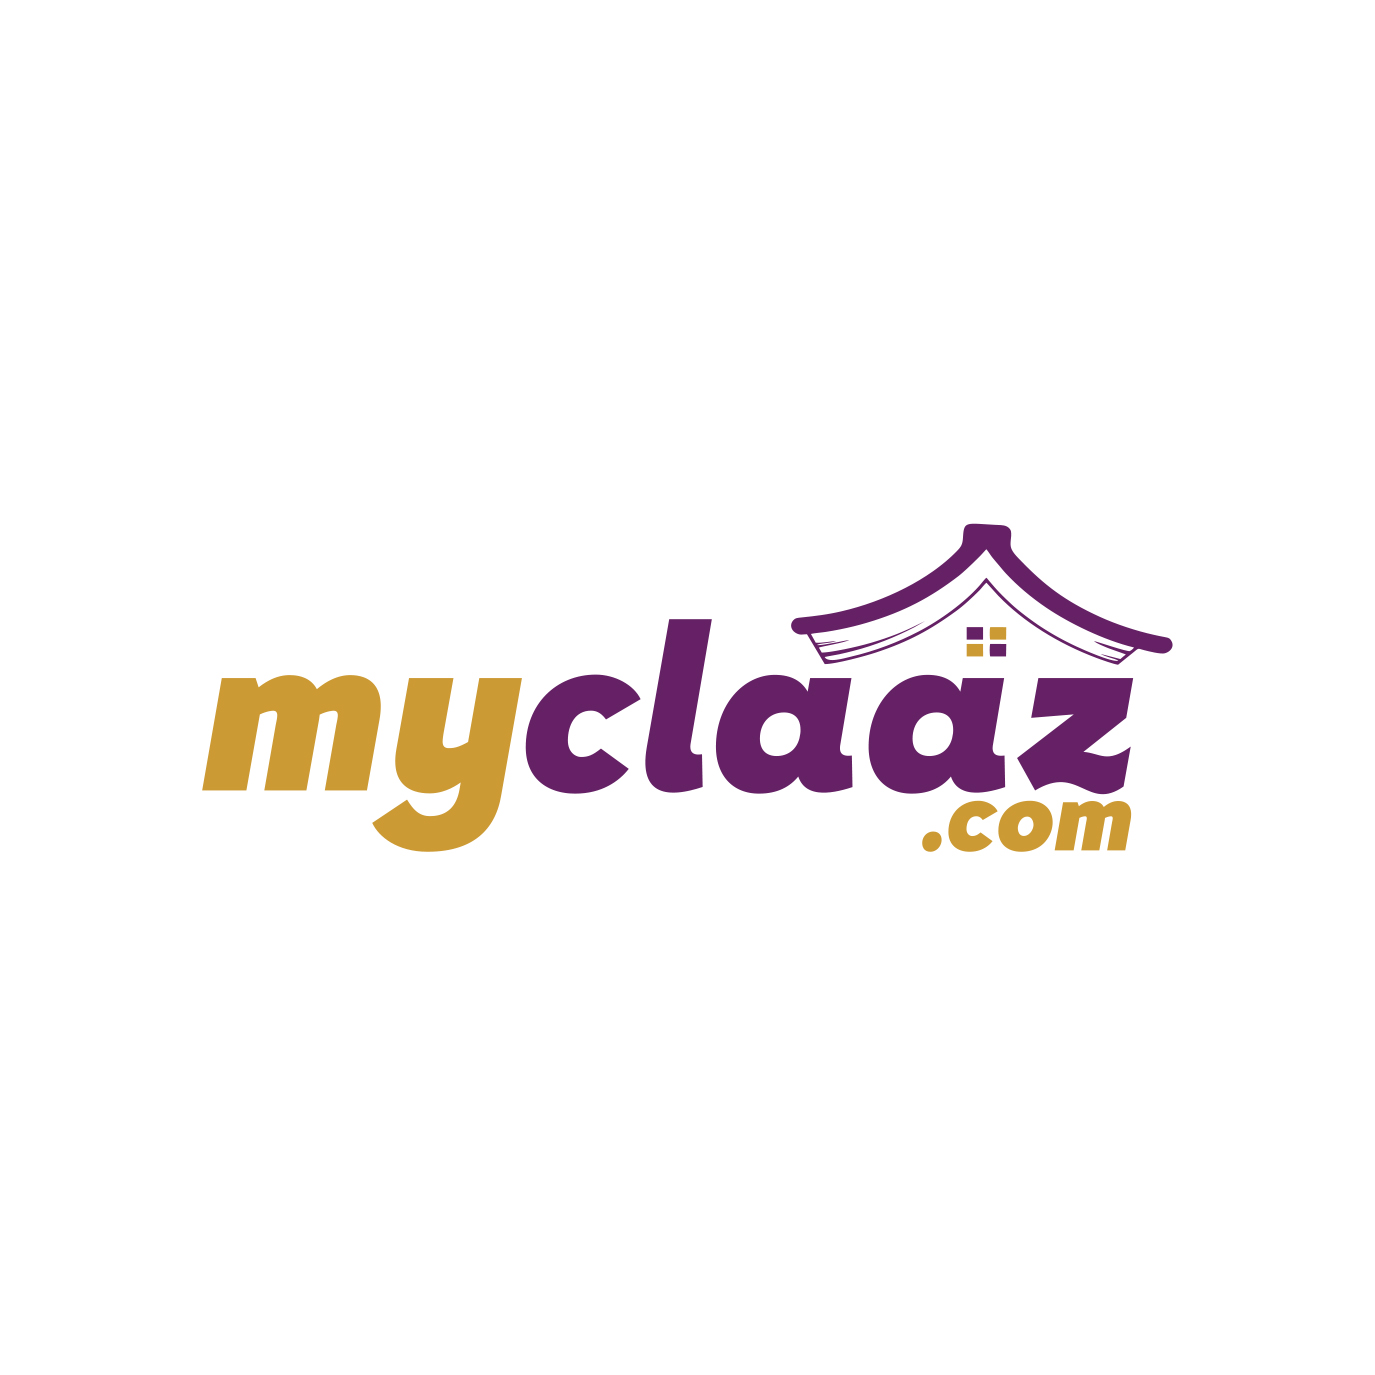 MYCLAAZ TECHNOLOGIES SDN BHD